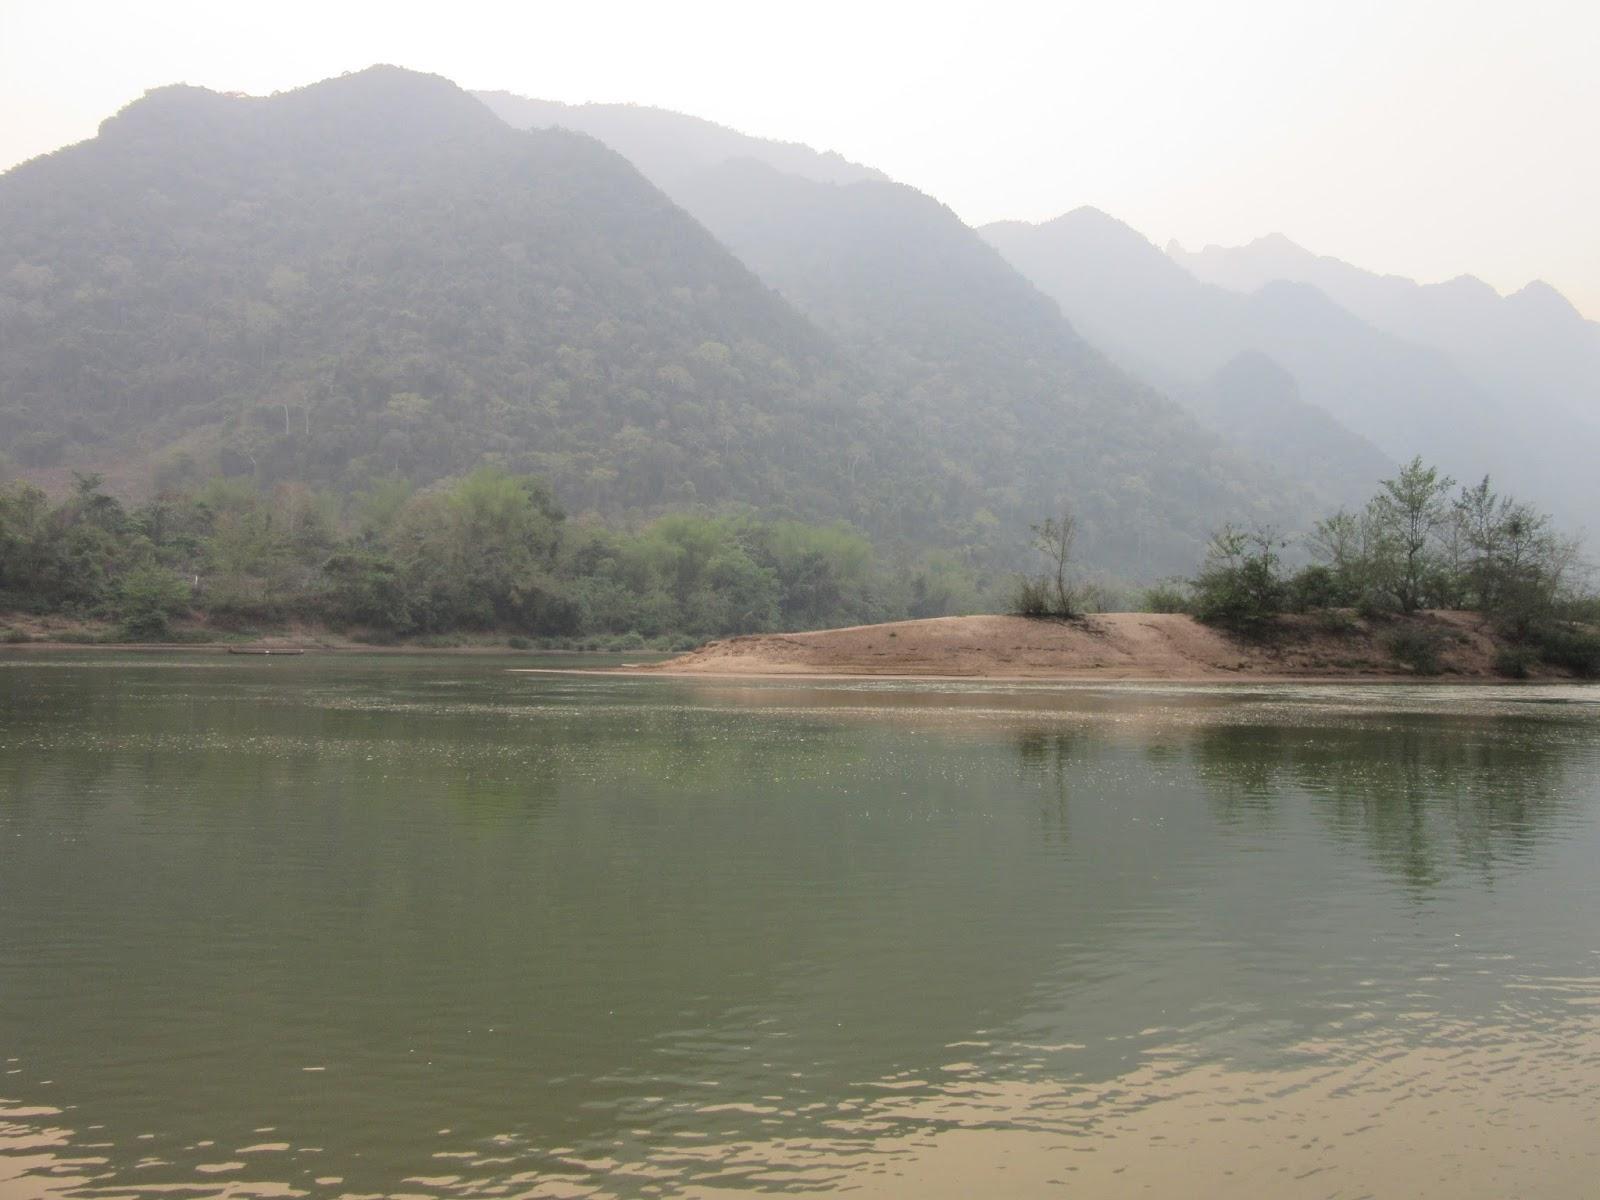 Río en Muang Ngoi, Laos